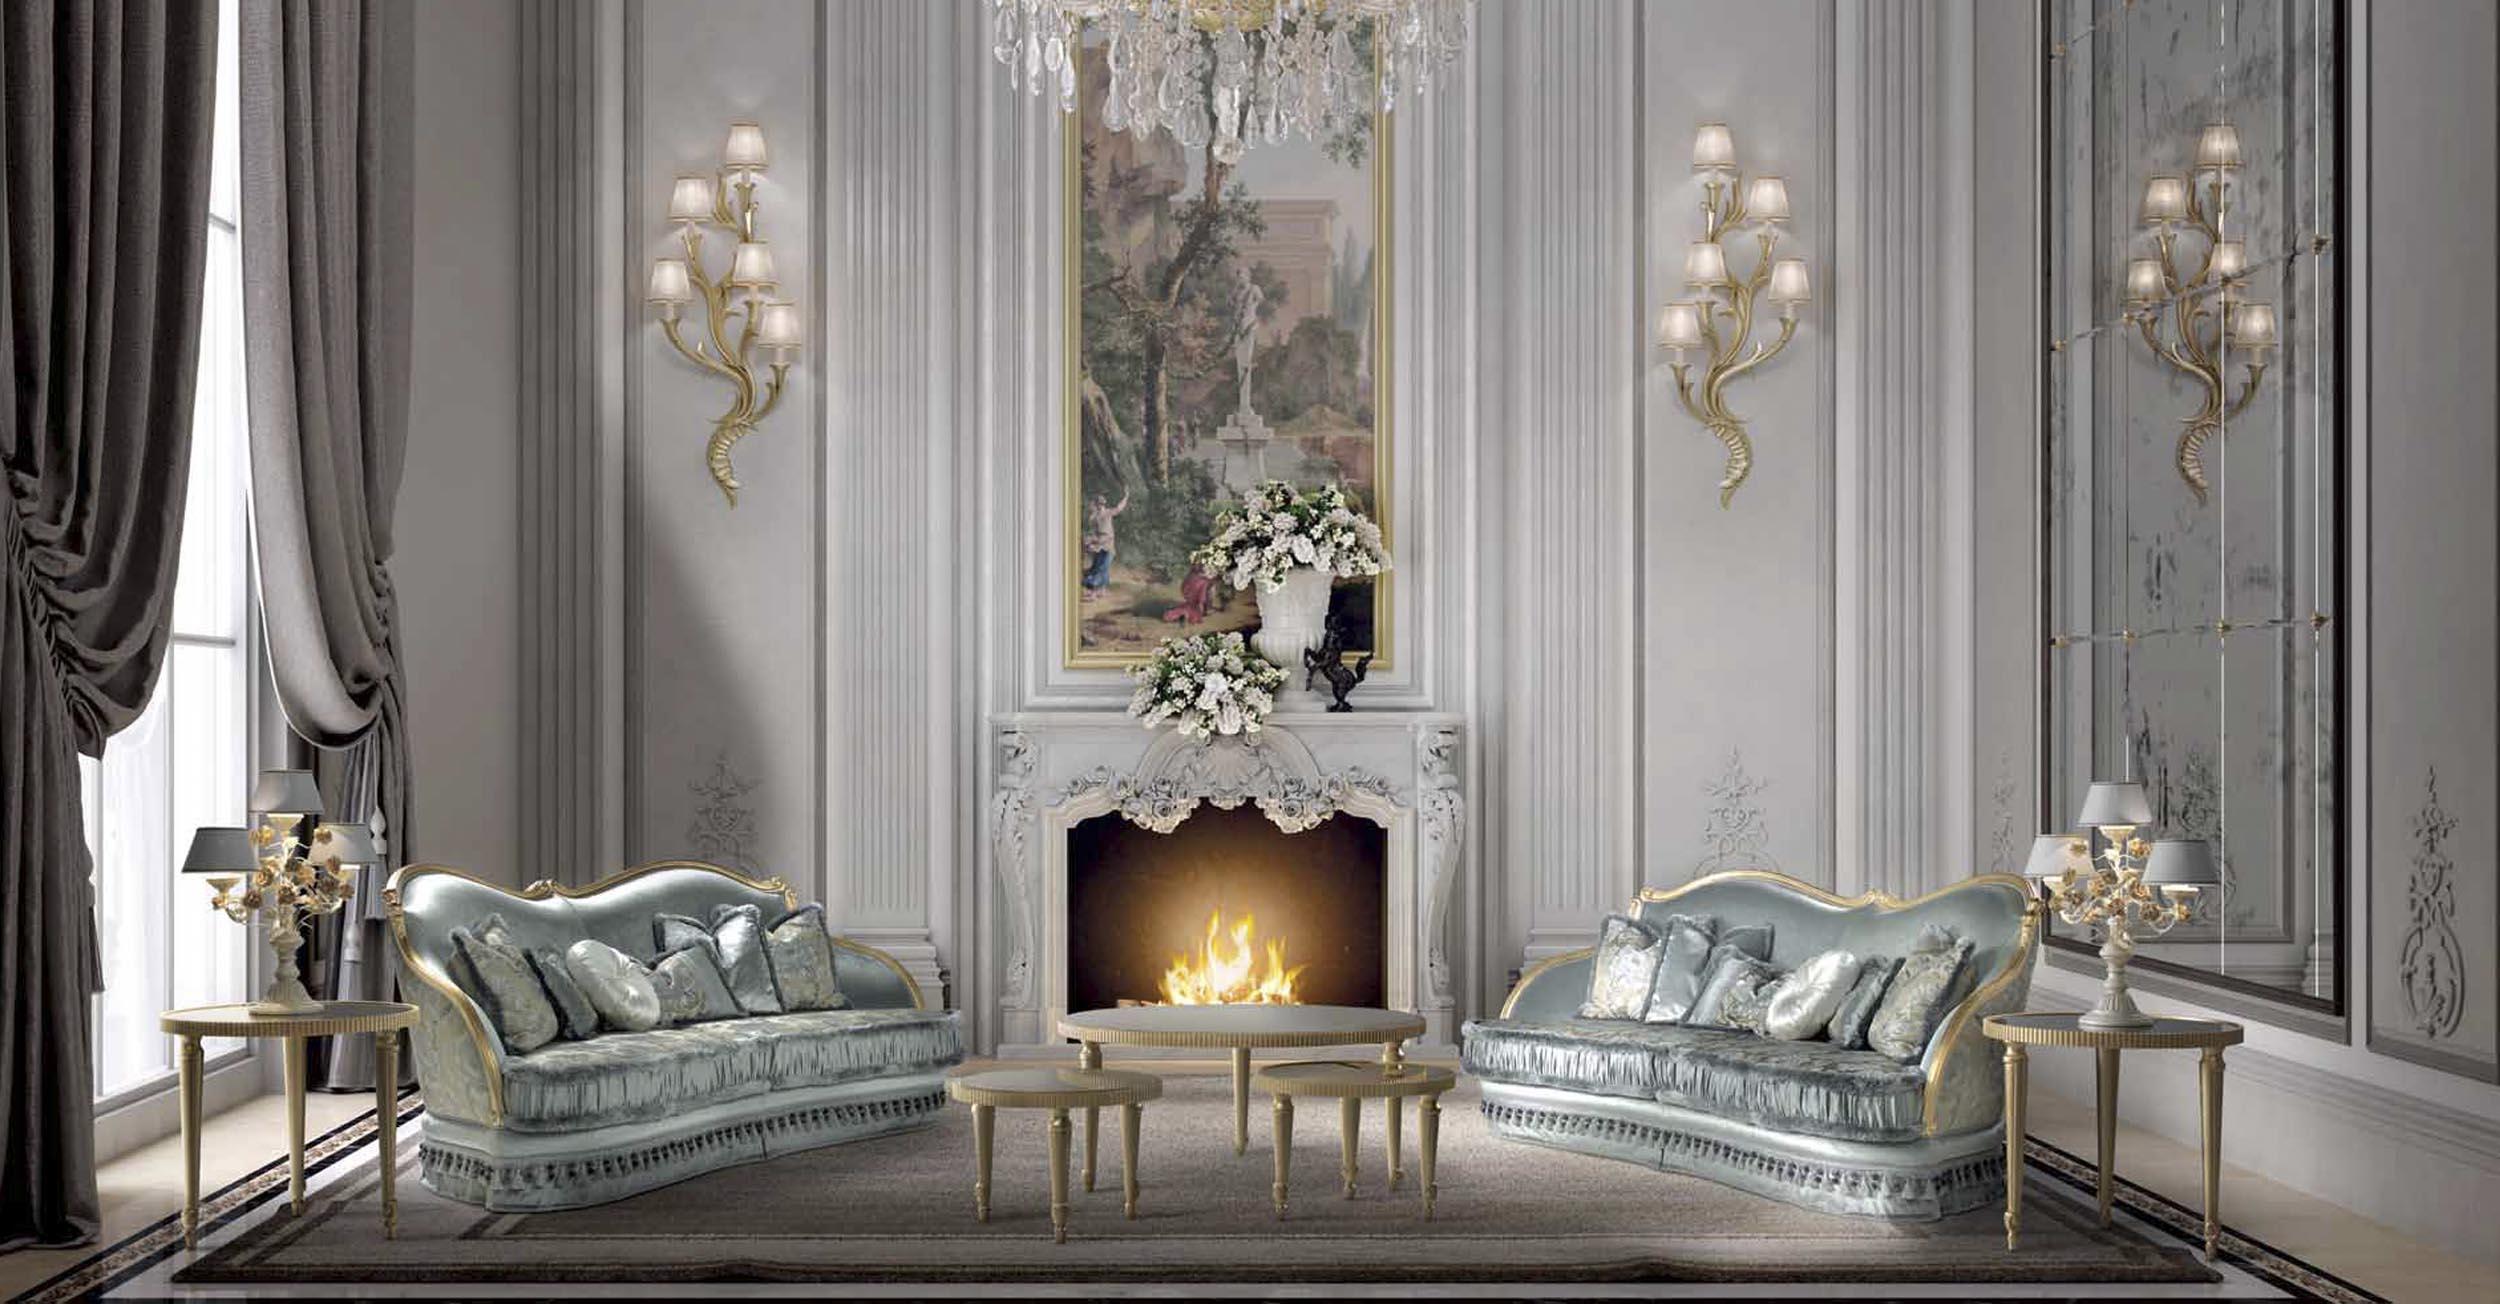 Vasari collection